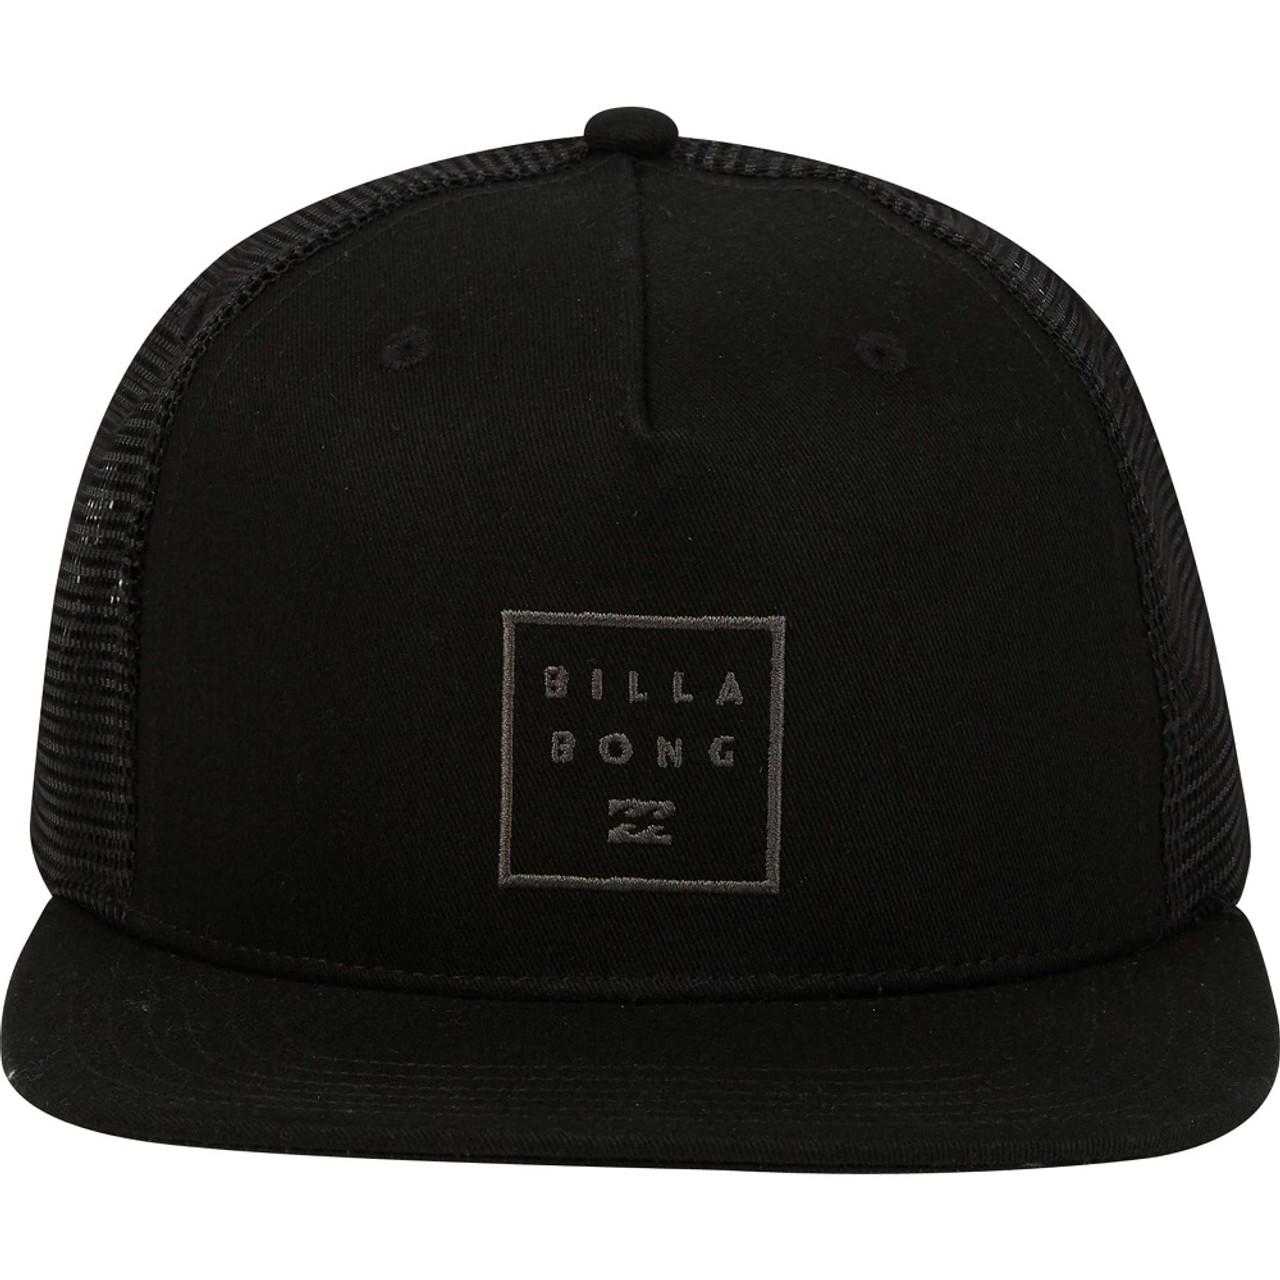 1d6f7f2ddc6 Billabong Stacked Trucker Hat Black Stealth OneSize ...